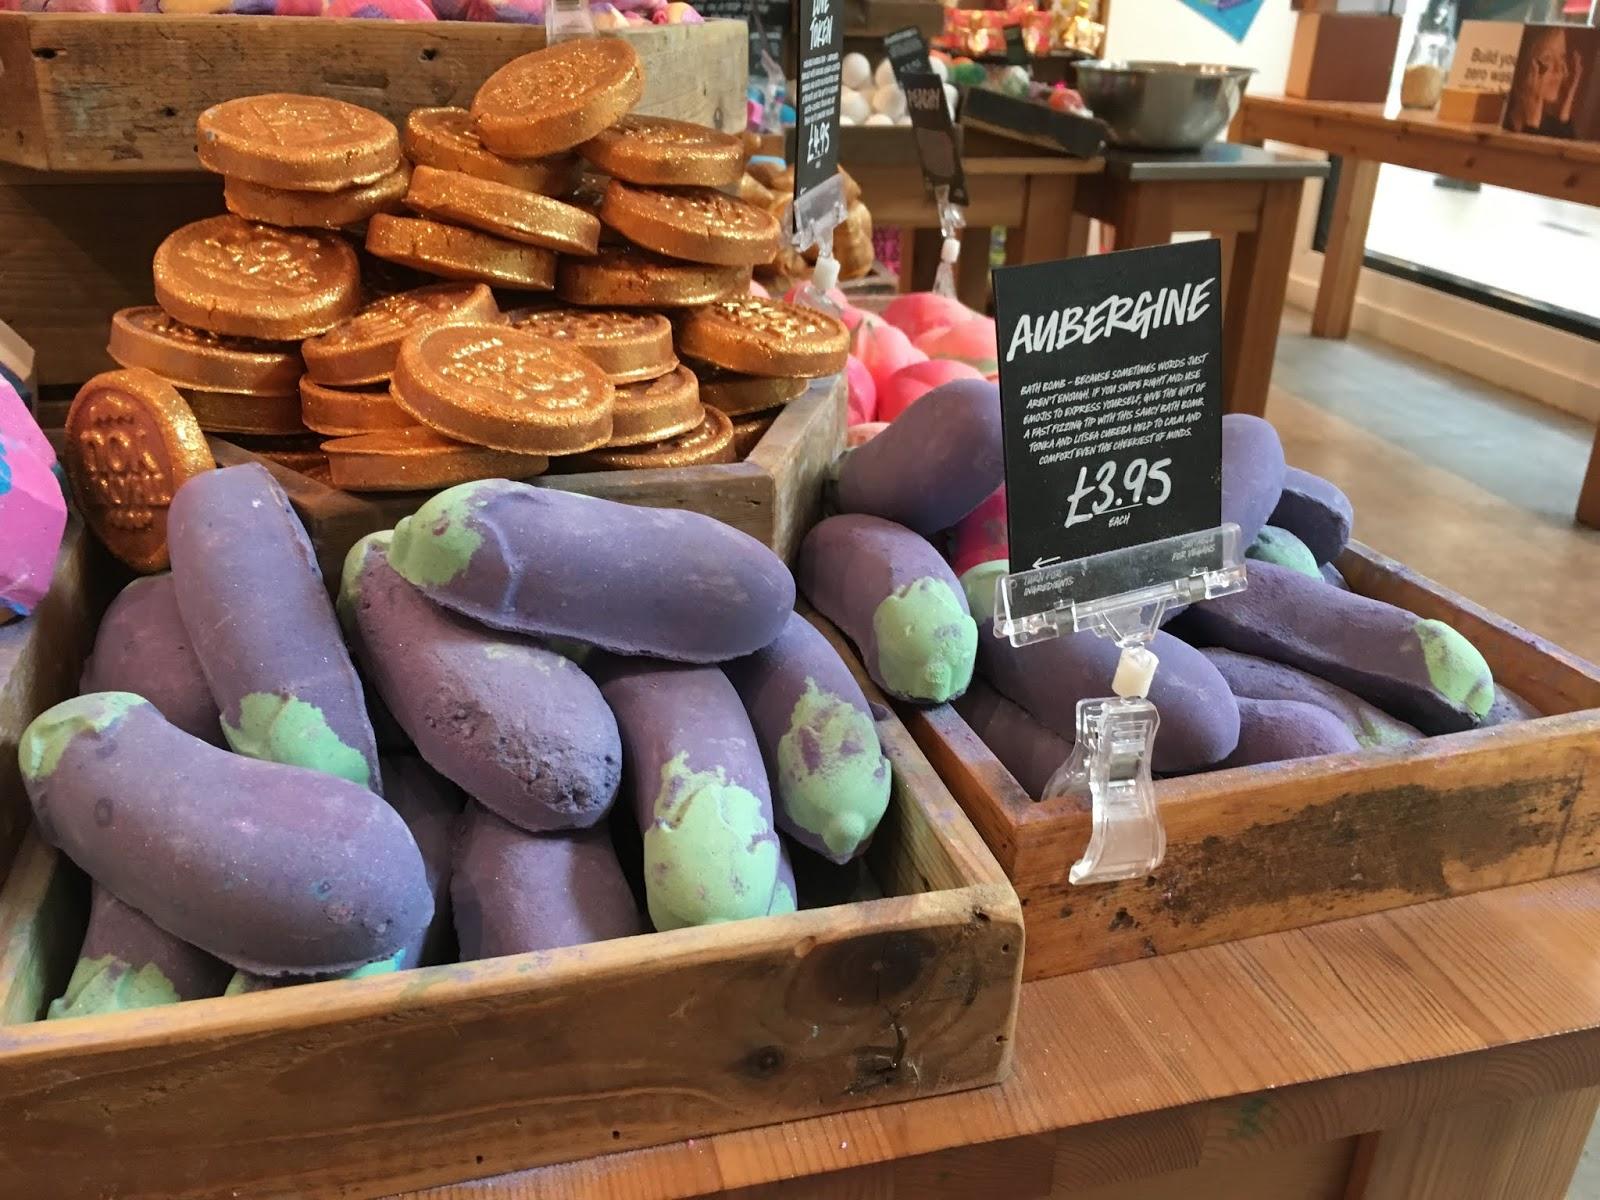 lush-aubergine-bath-bomb